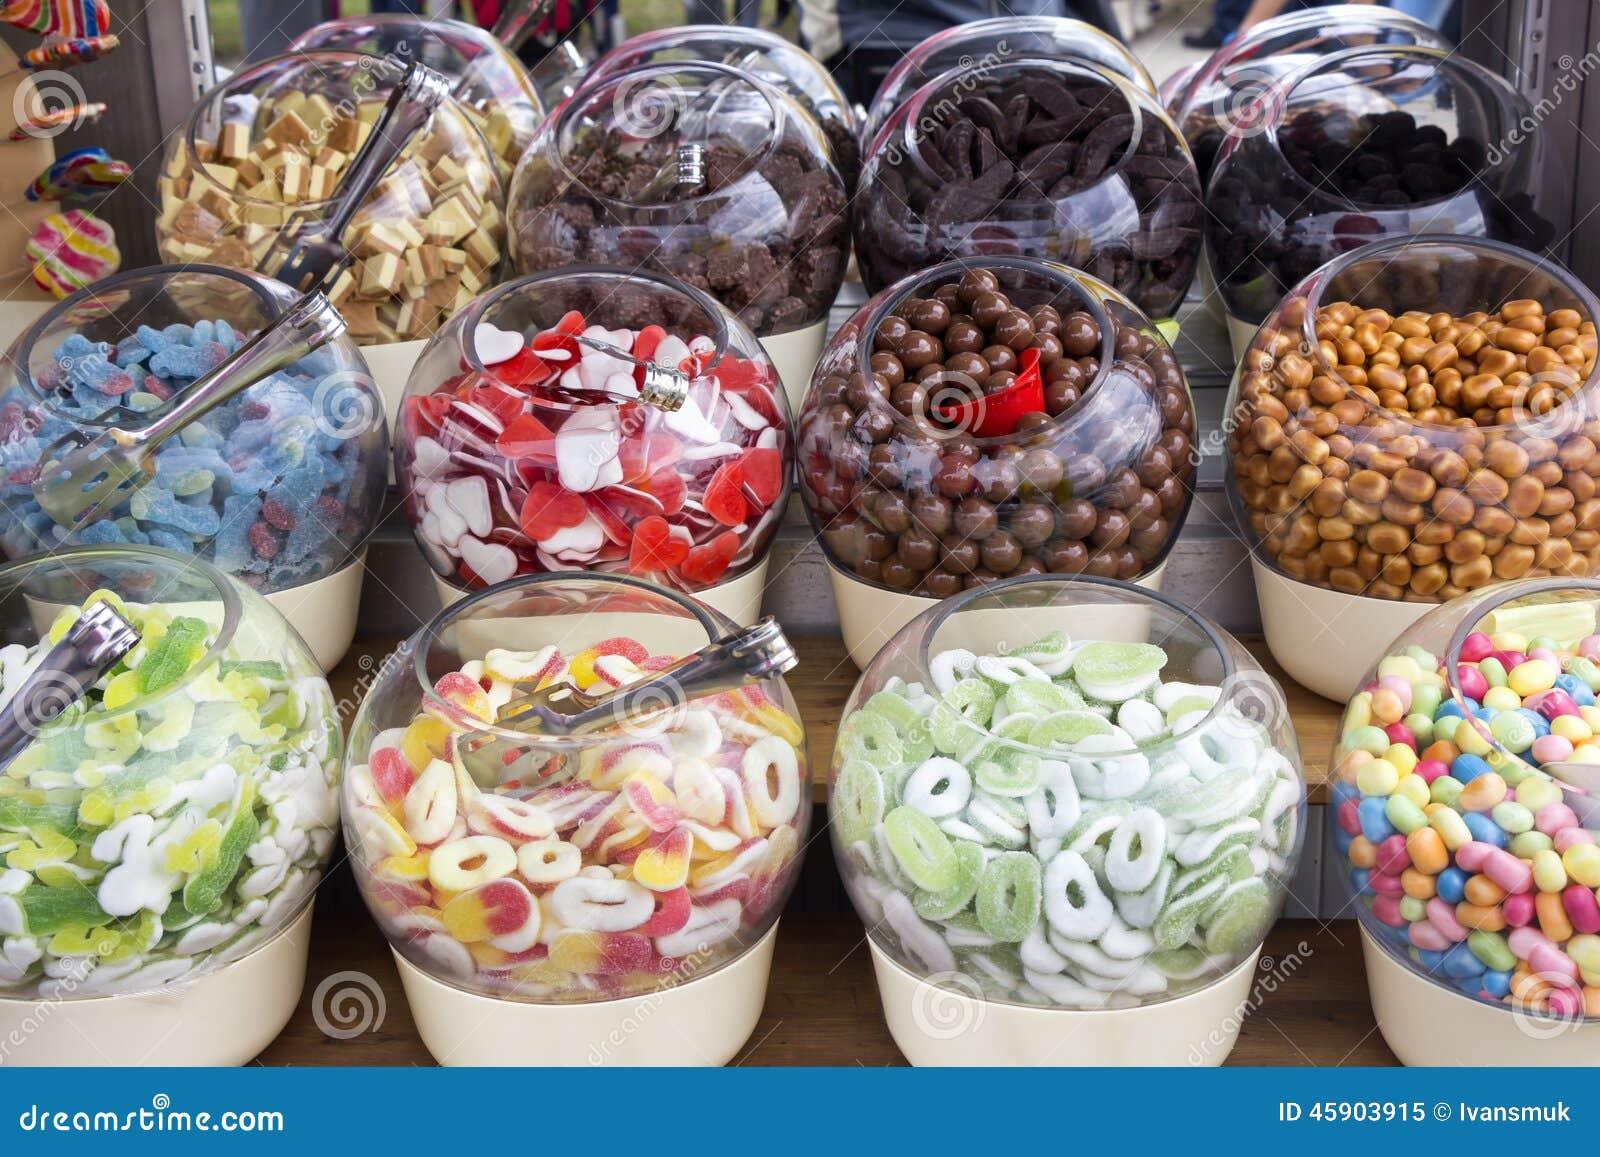 Caramelos coloridos en bol de vidrio imagen de archivo - Bol de vidrio ...